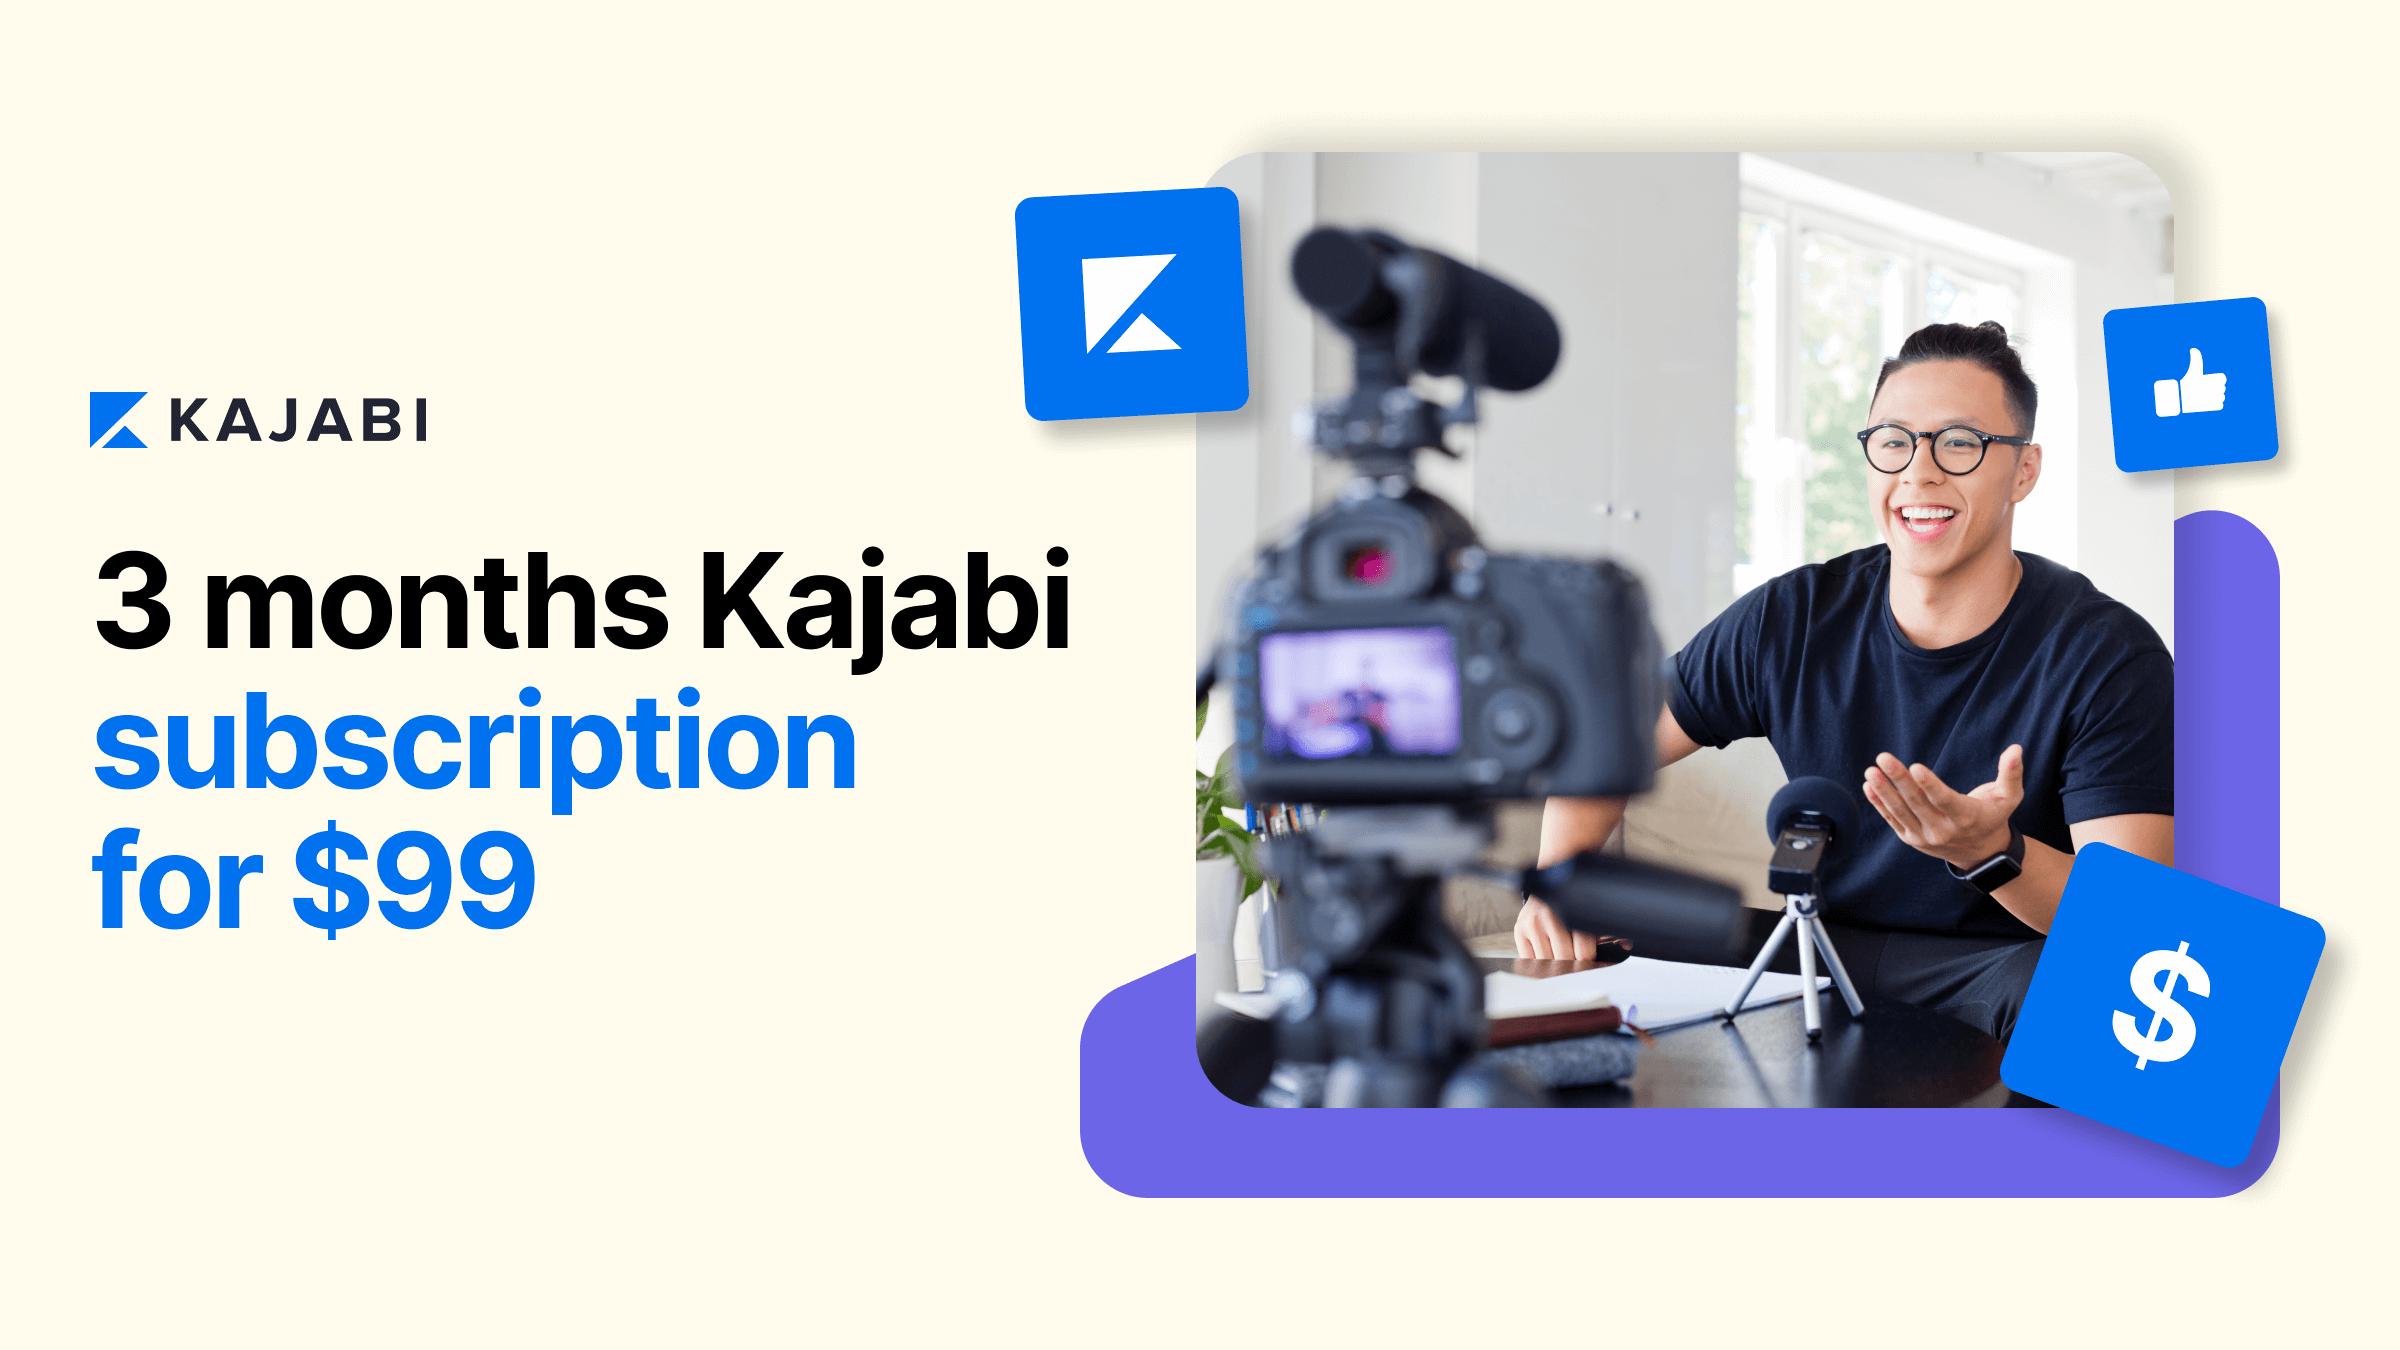 Kajabi 3 Months For $99 Promotion